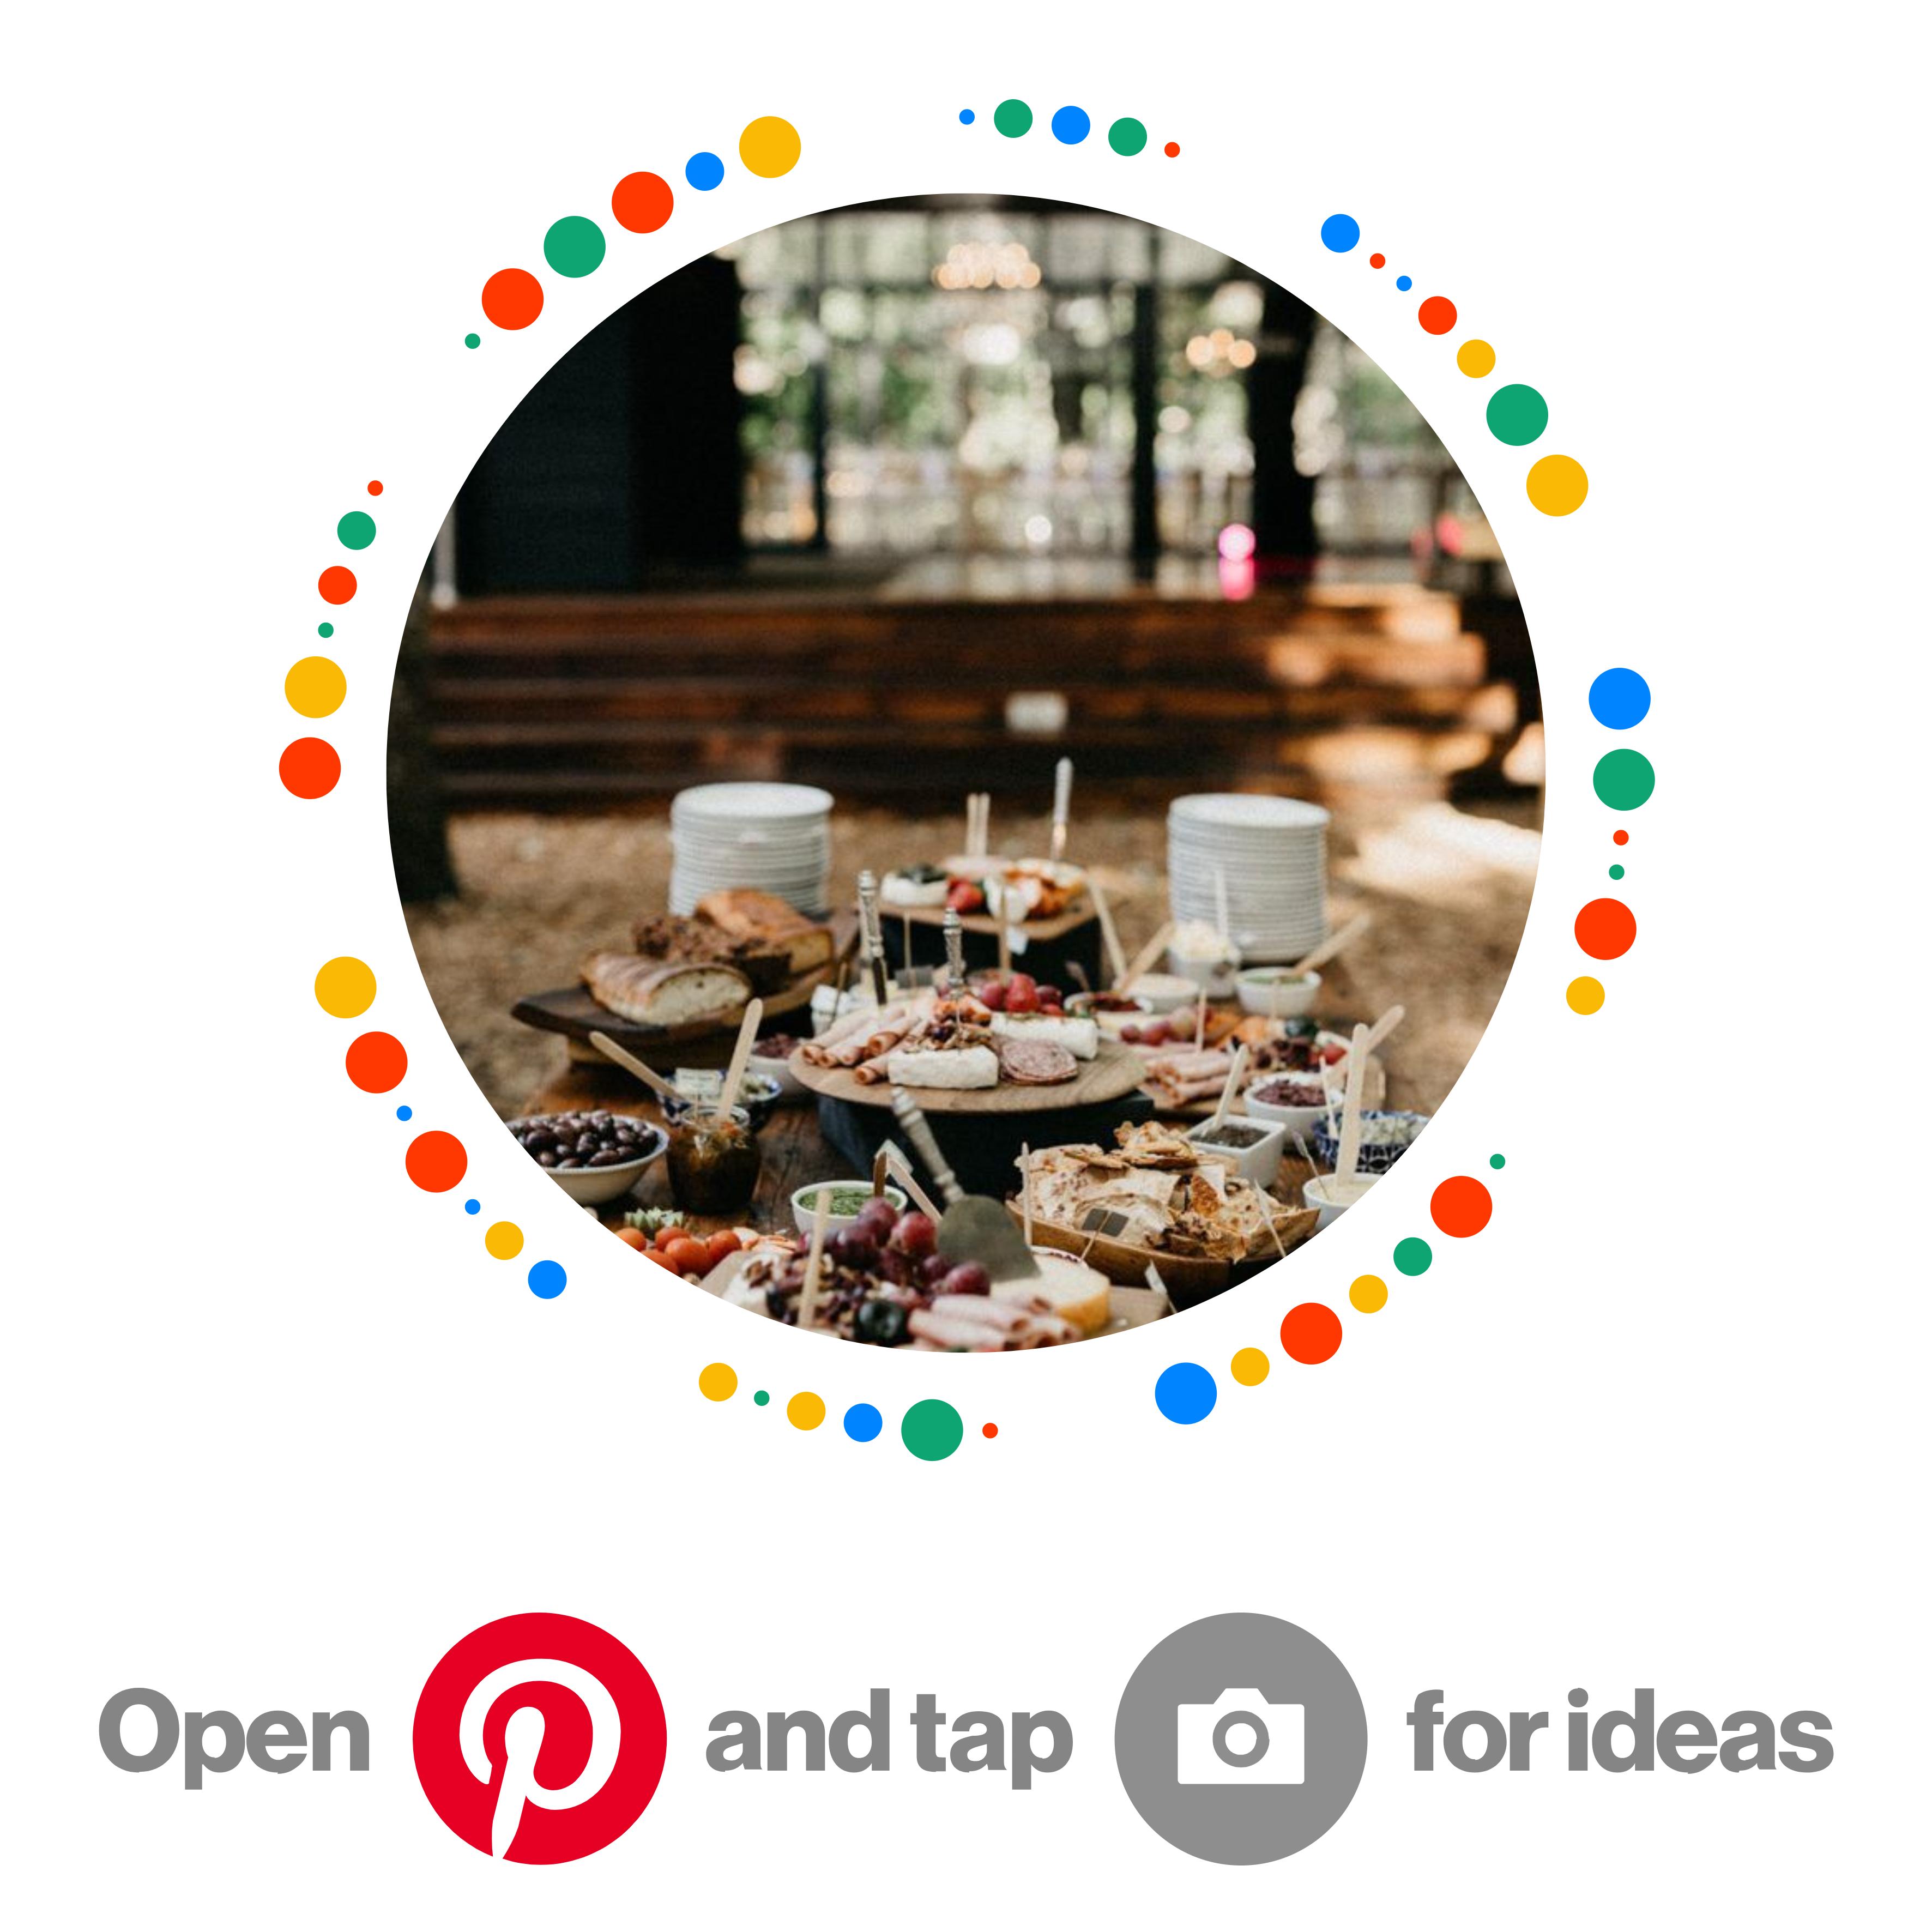 Wedding food ideas on Pinterest